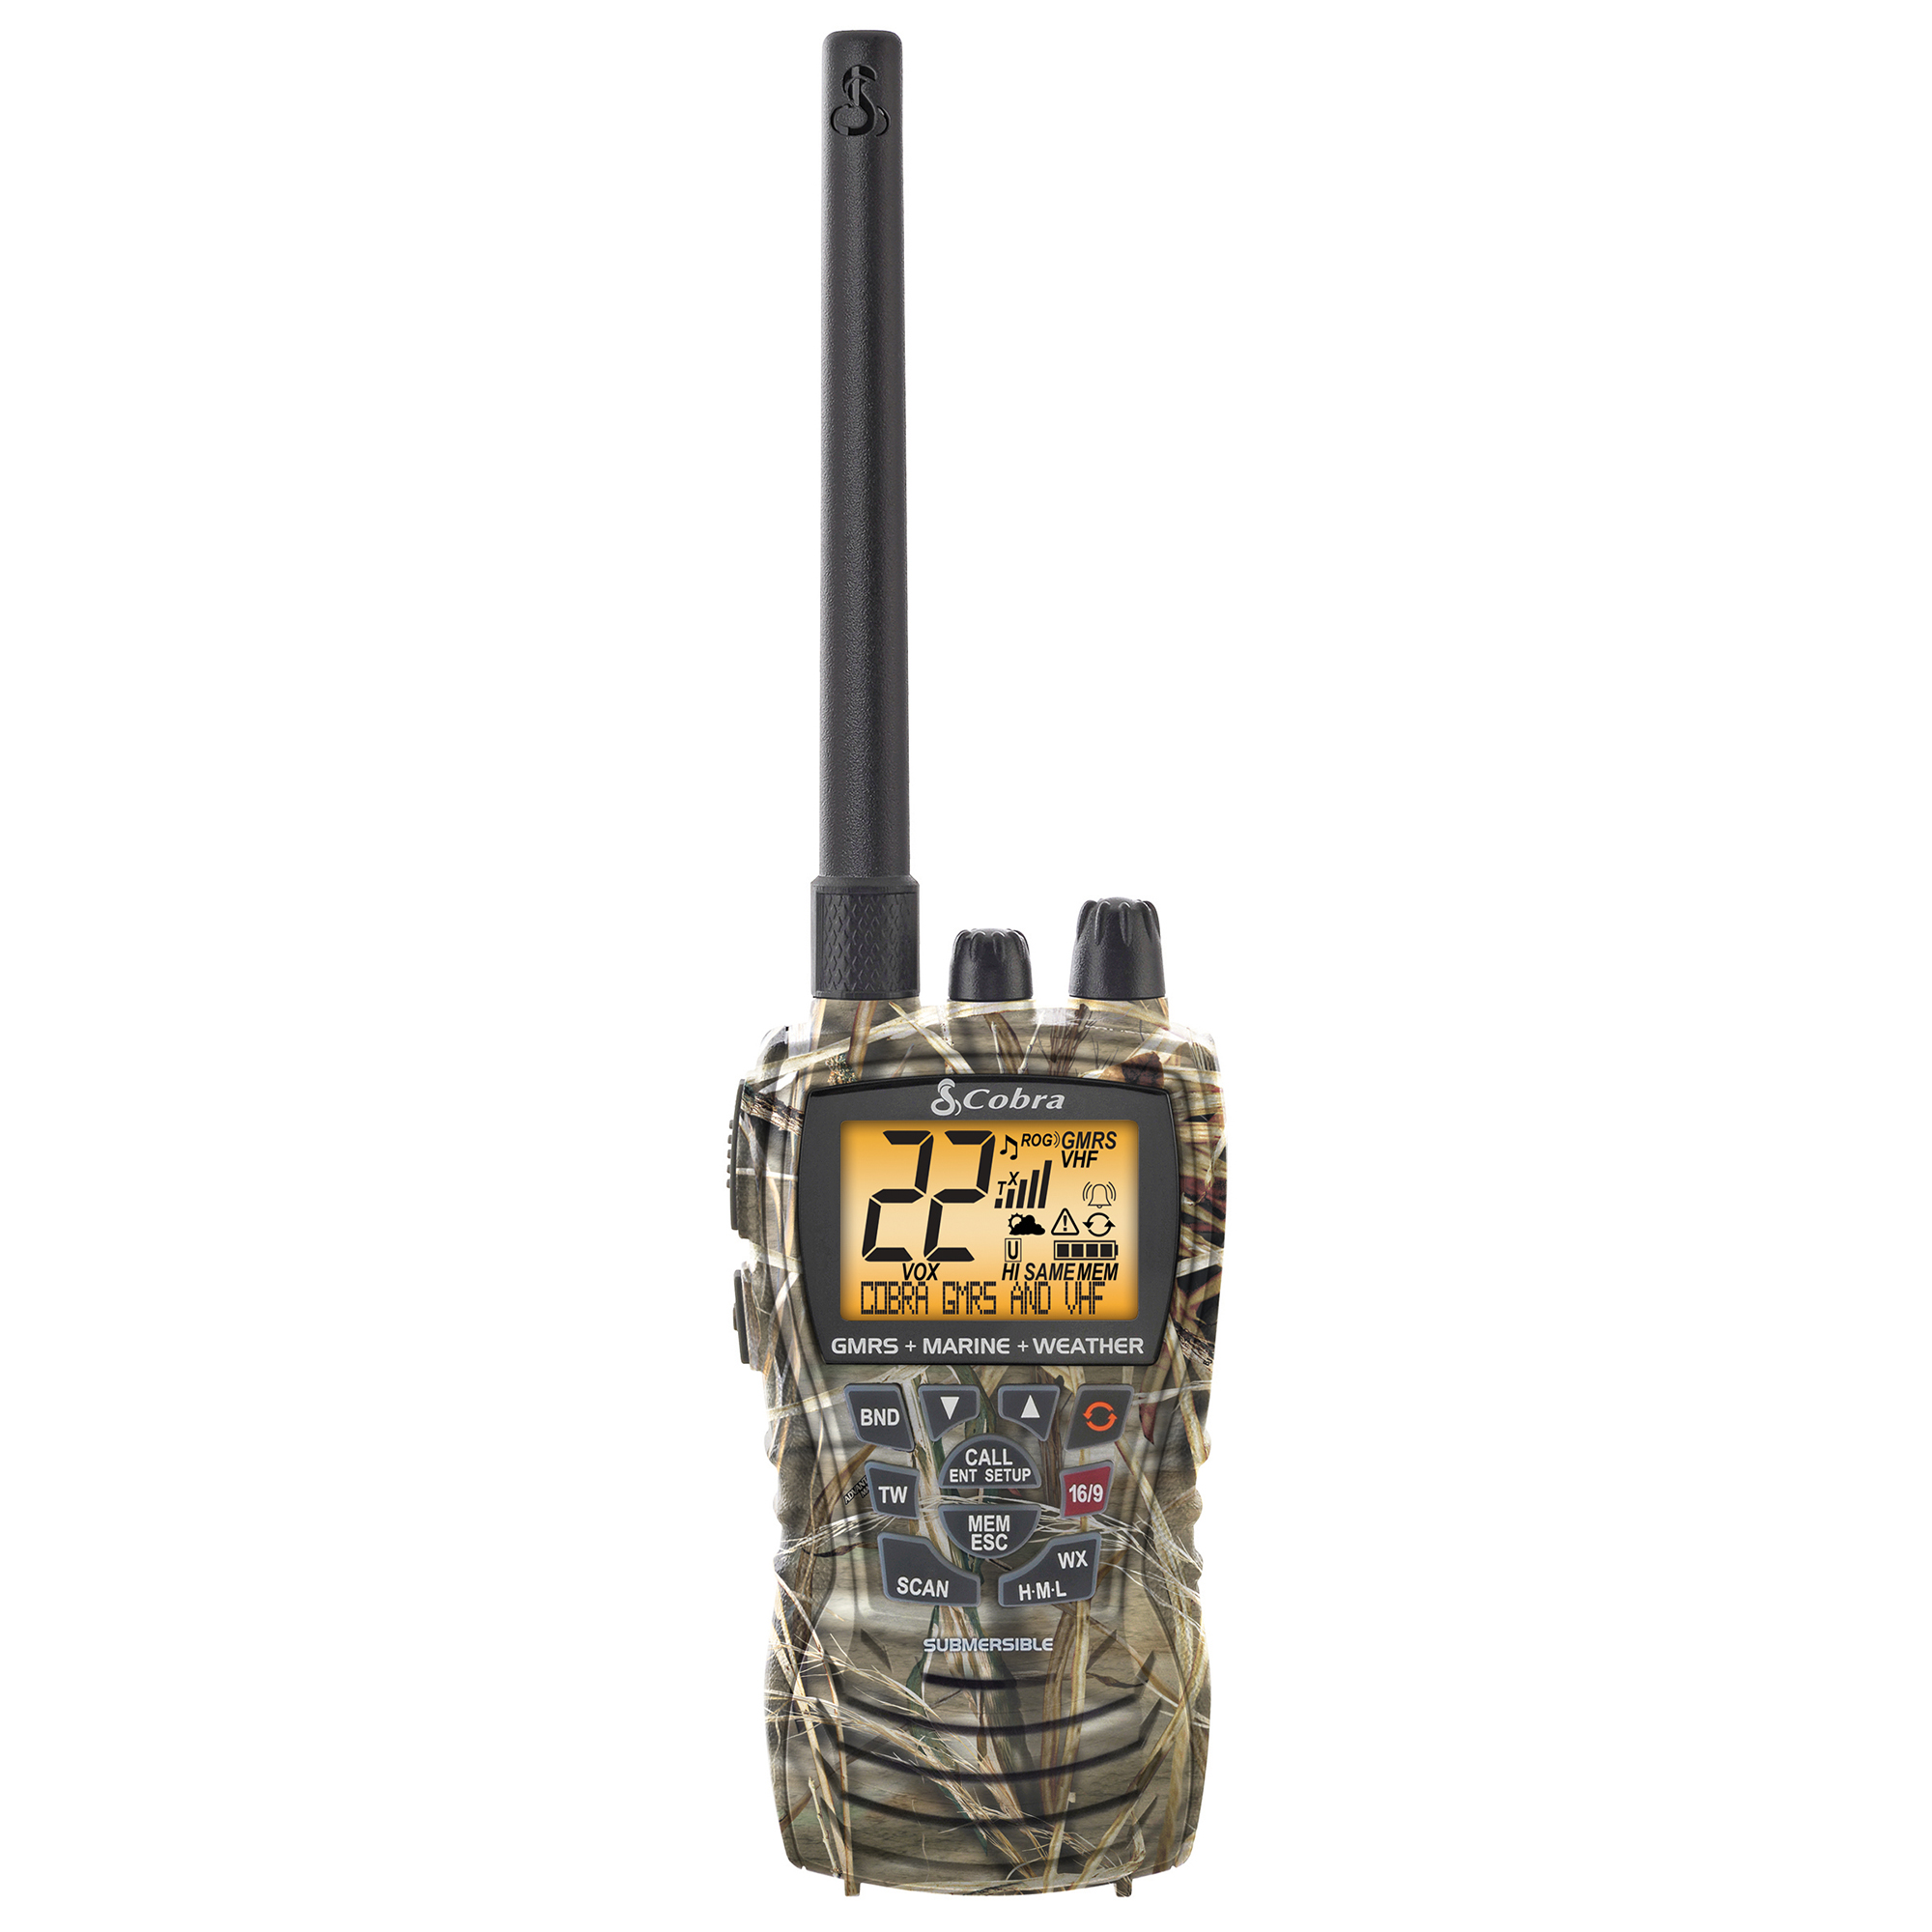 c013ac1f99f14 Cobra MR HH450 Dual Combination VHF and GMRS Radio, Realtree Max-4 Camo (